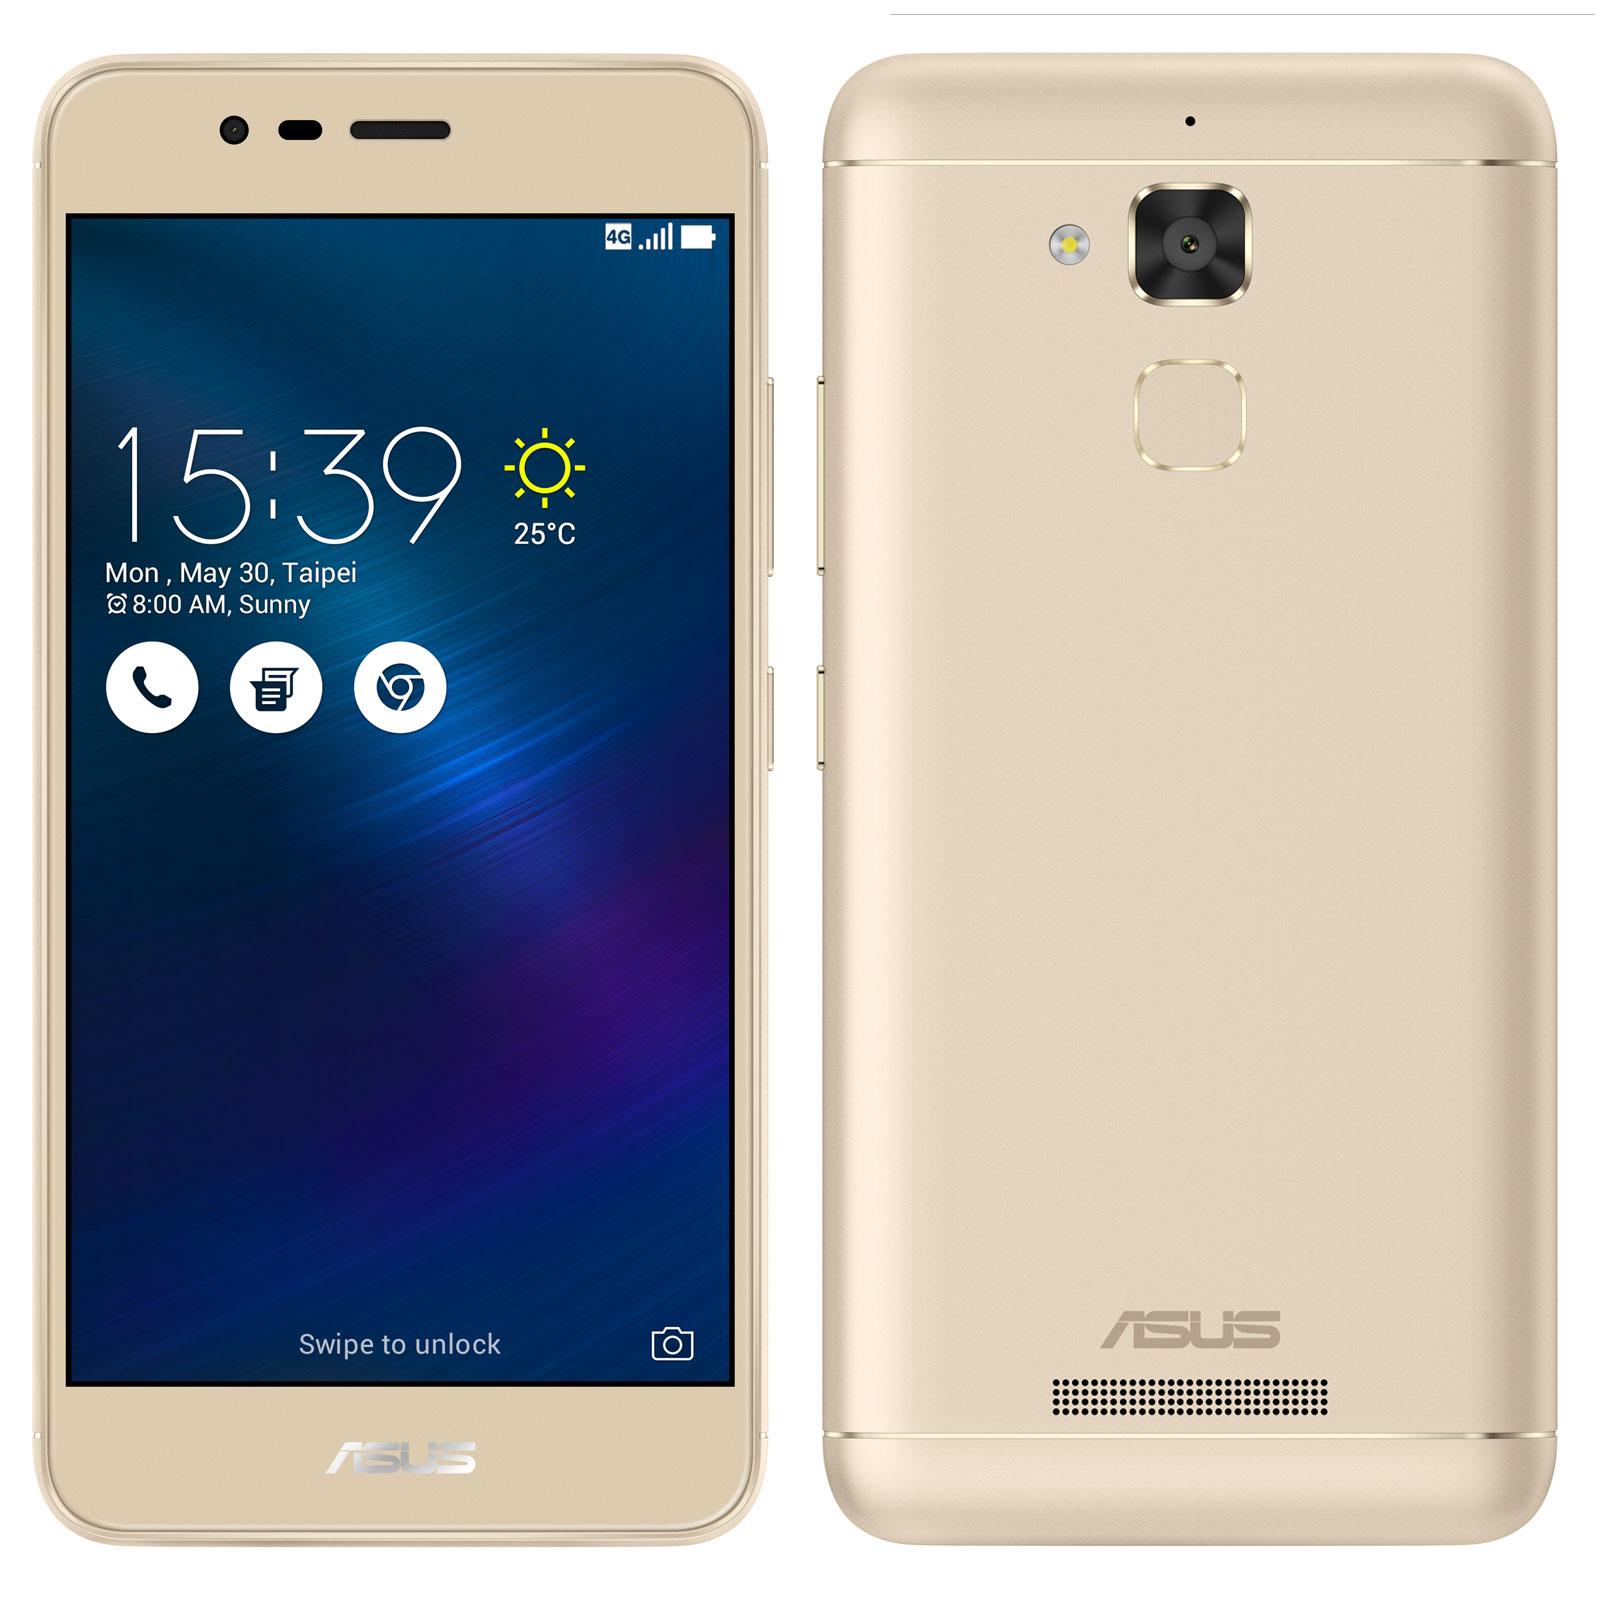 "Mobile & smartphone ASUS ZenFone 3 Max ZC520TL Or Smartphone 4G-LTE Dual SIM - MediaTek MT6737 Quad-Core 1.3 GHz - RAM 3 Go - Ecran tactile 5.2"" 720 x 1280 - 32 Go - Bluetooth 4.0 - 4130 mAh - Android 6.0"